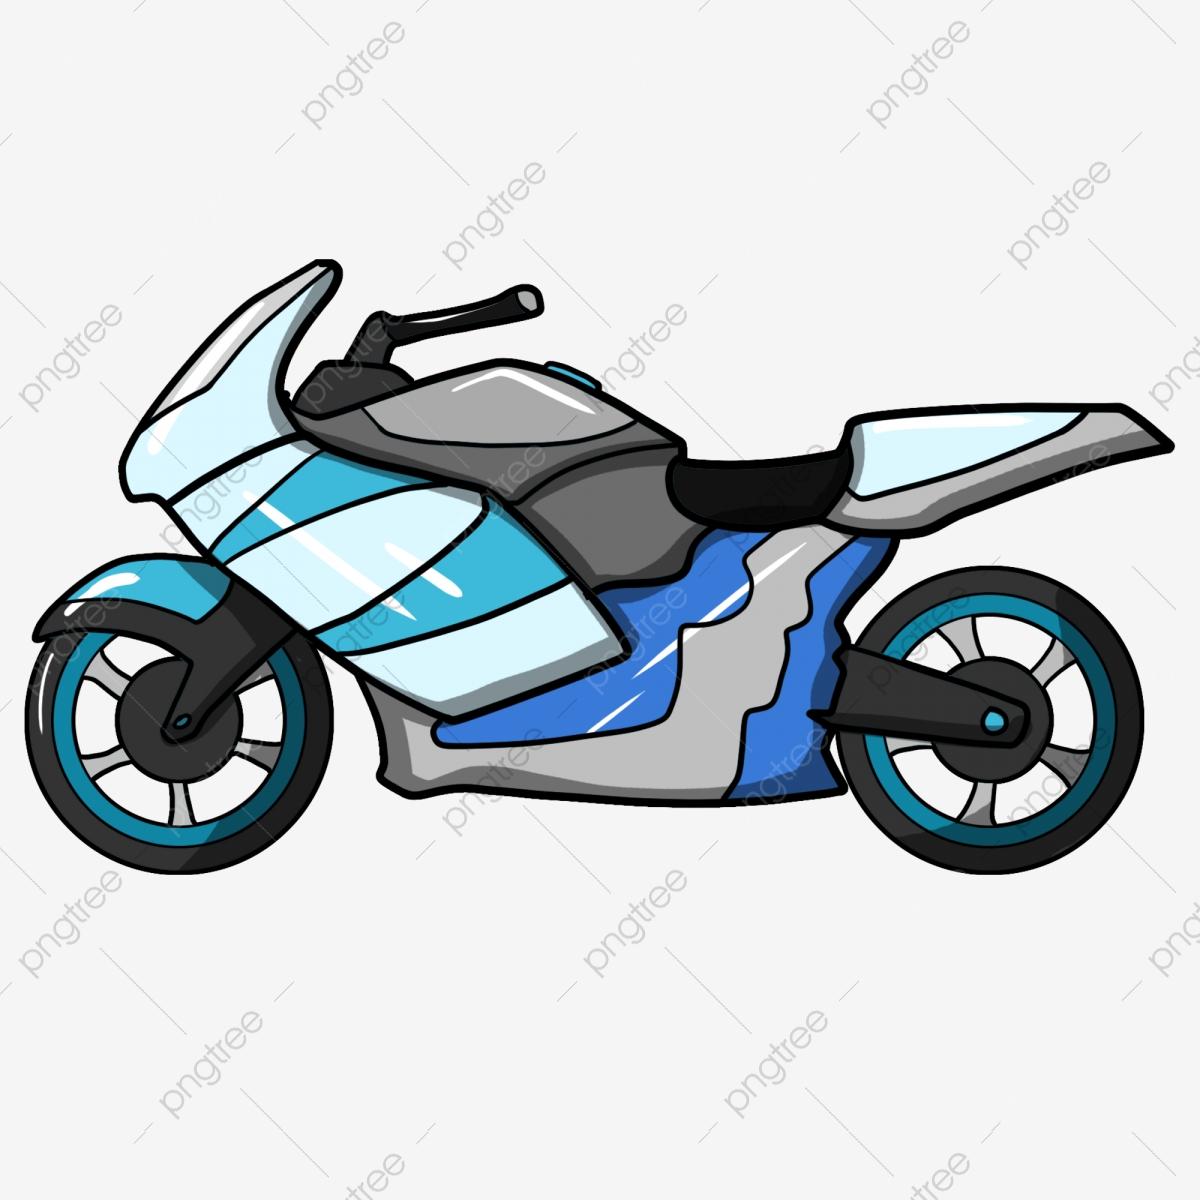 Motorcycle clipart blue motorcycle. Cartoon locomotive